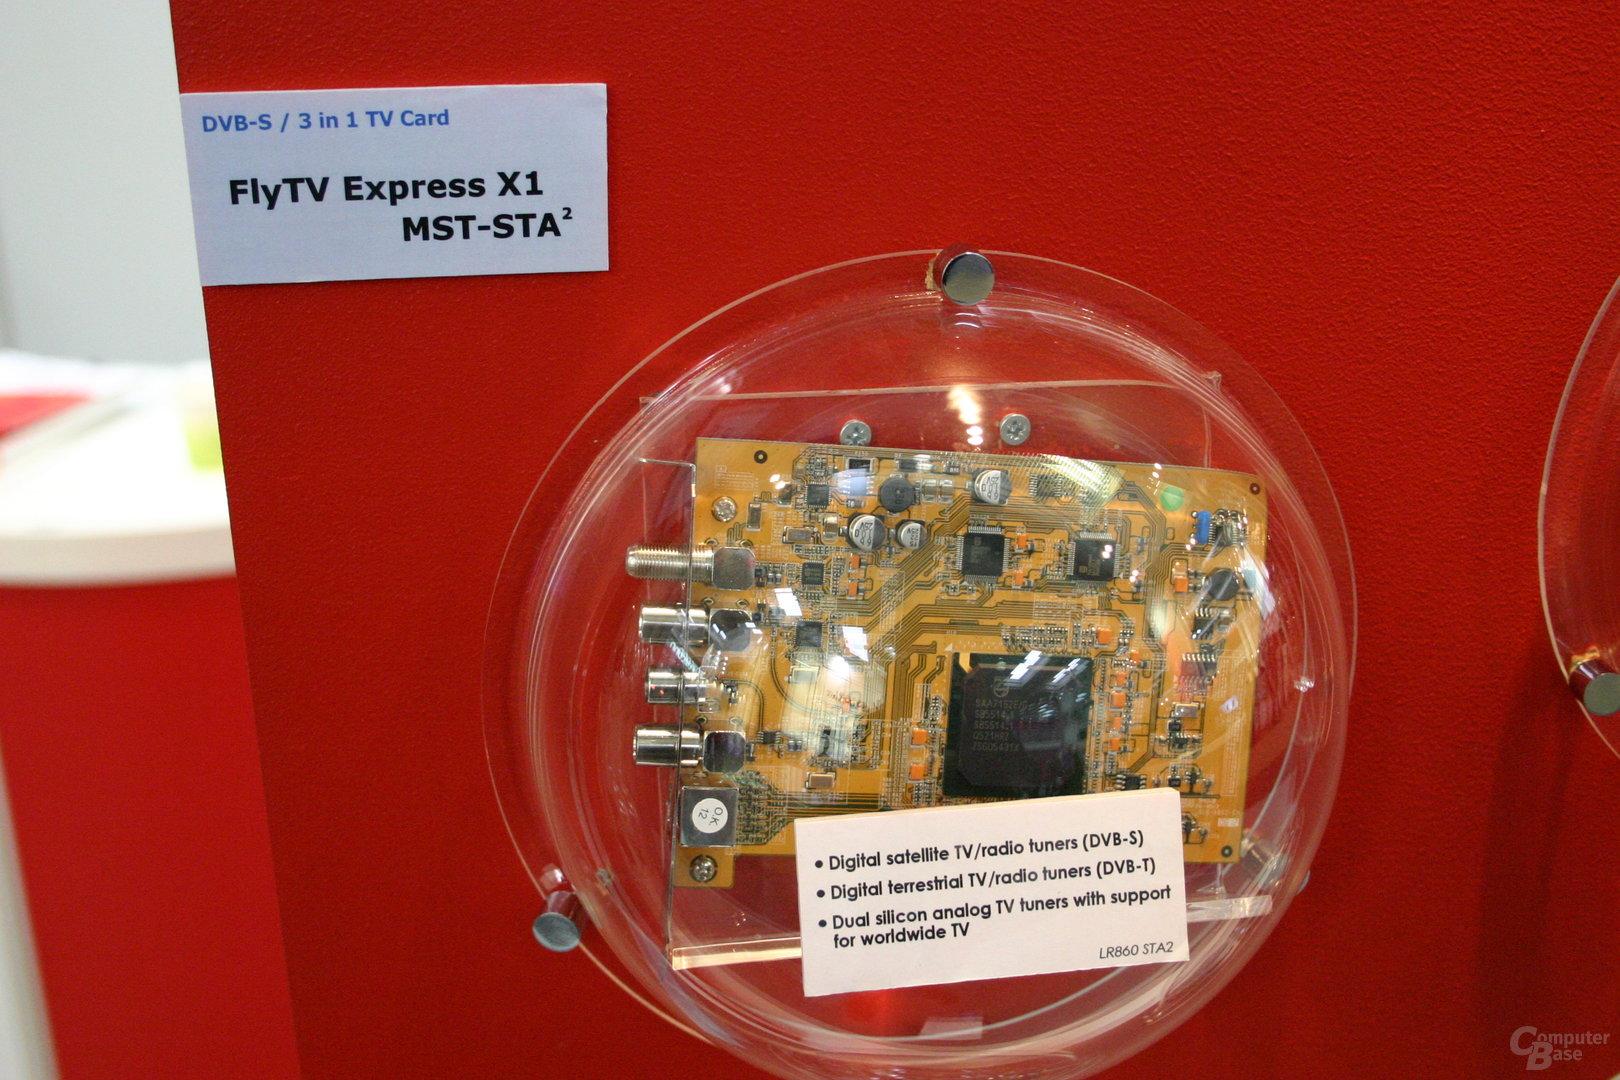 FlyTV Express X1 MST-STA² (DVB-T, DVB-S, Analog)